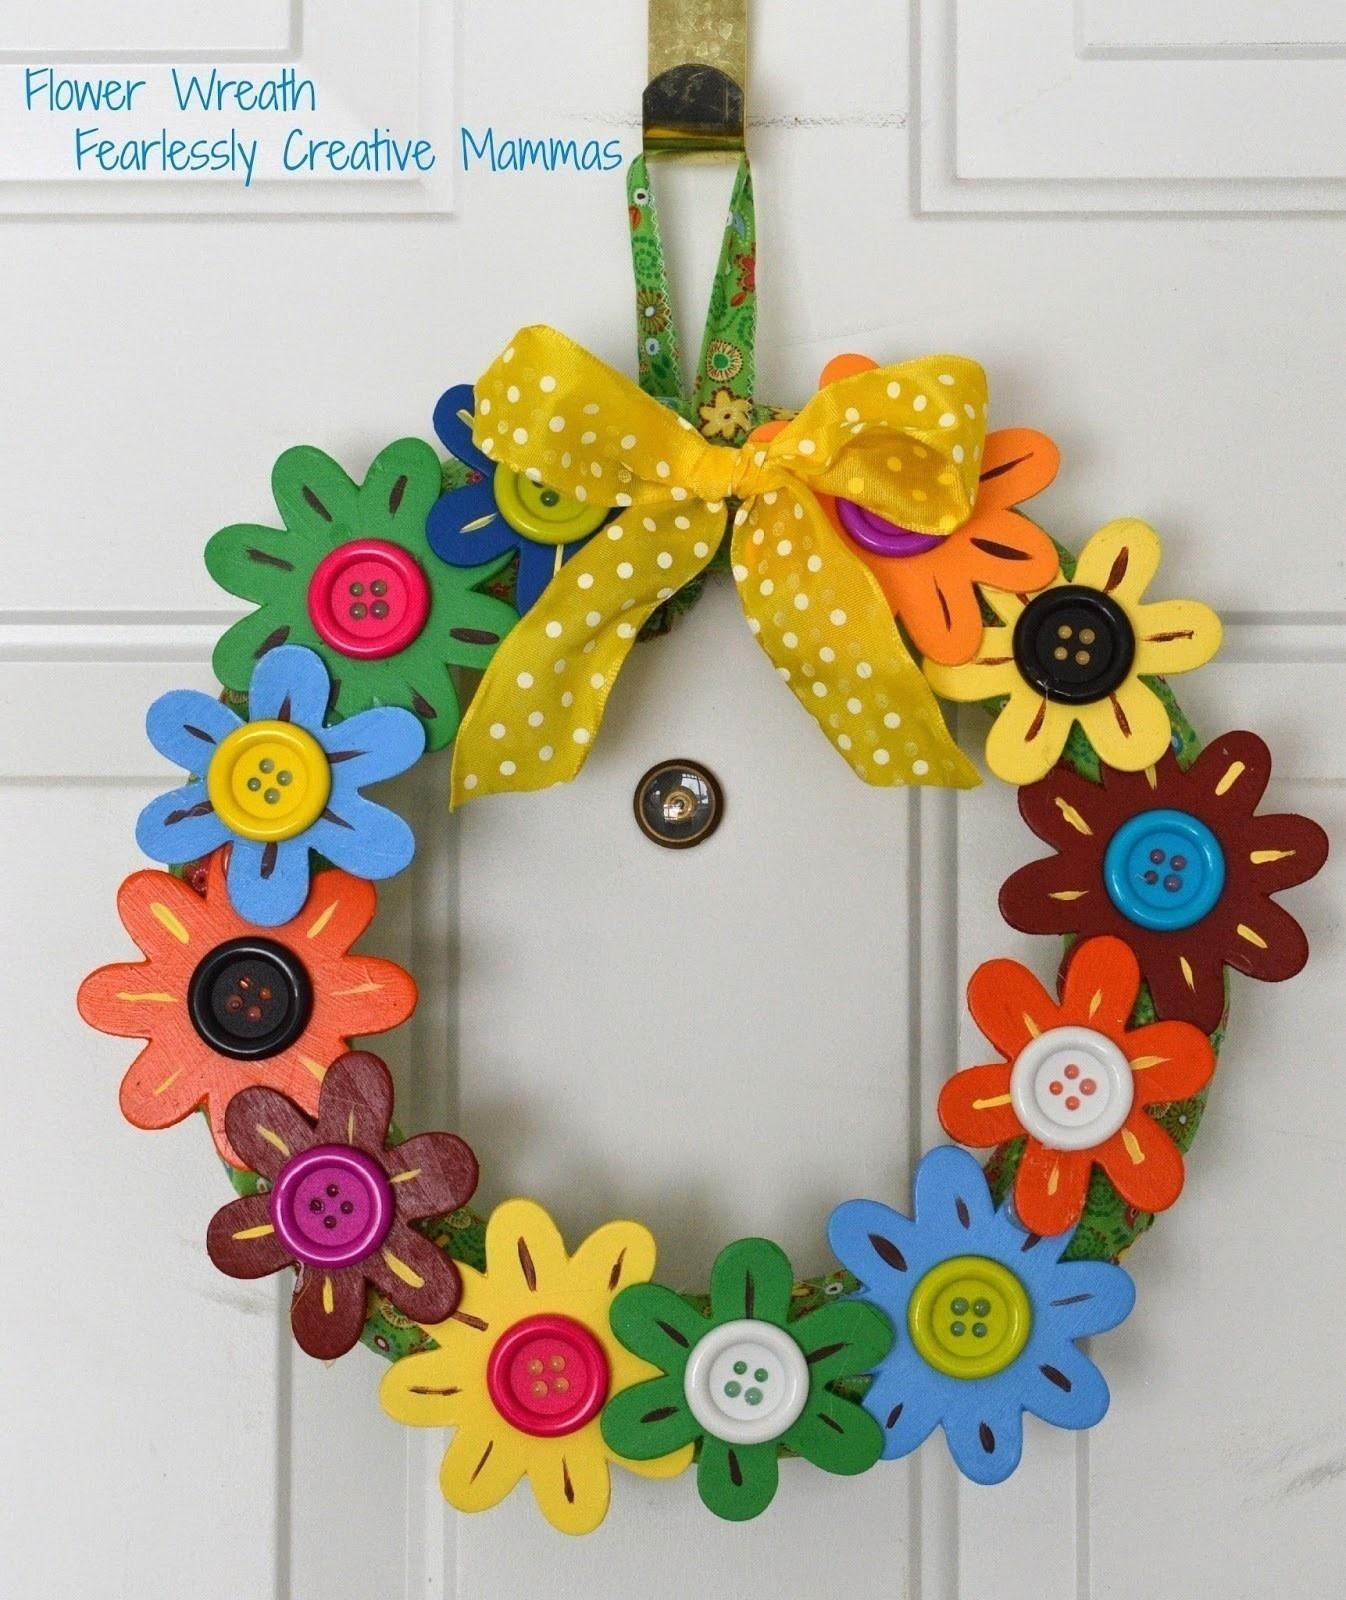 Flower Door Wreath 183 How To Make A Floral Wreath